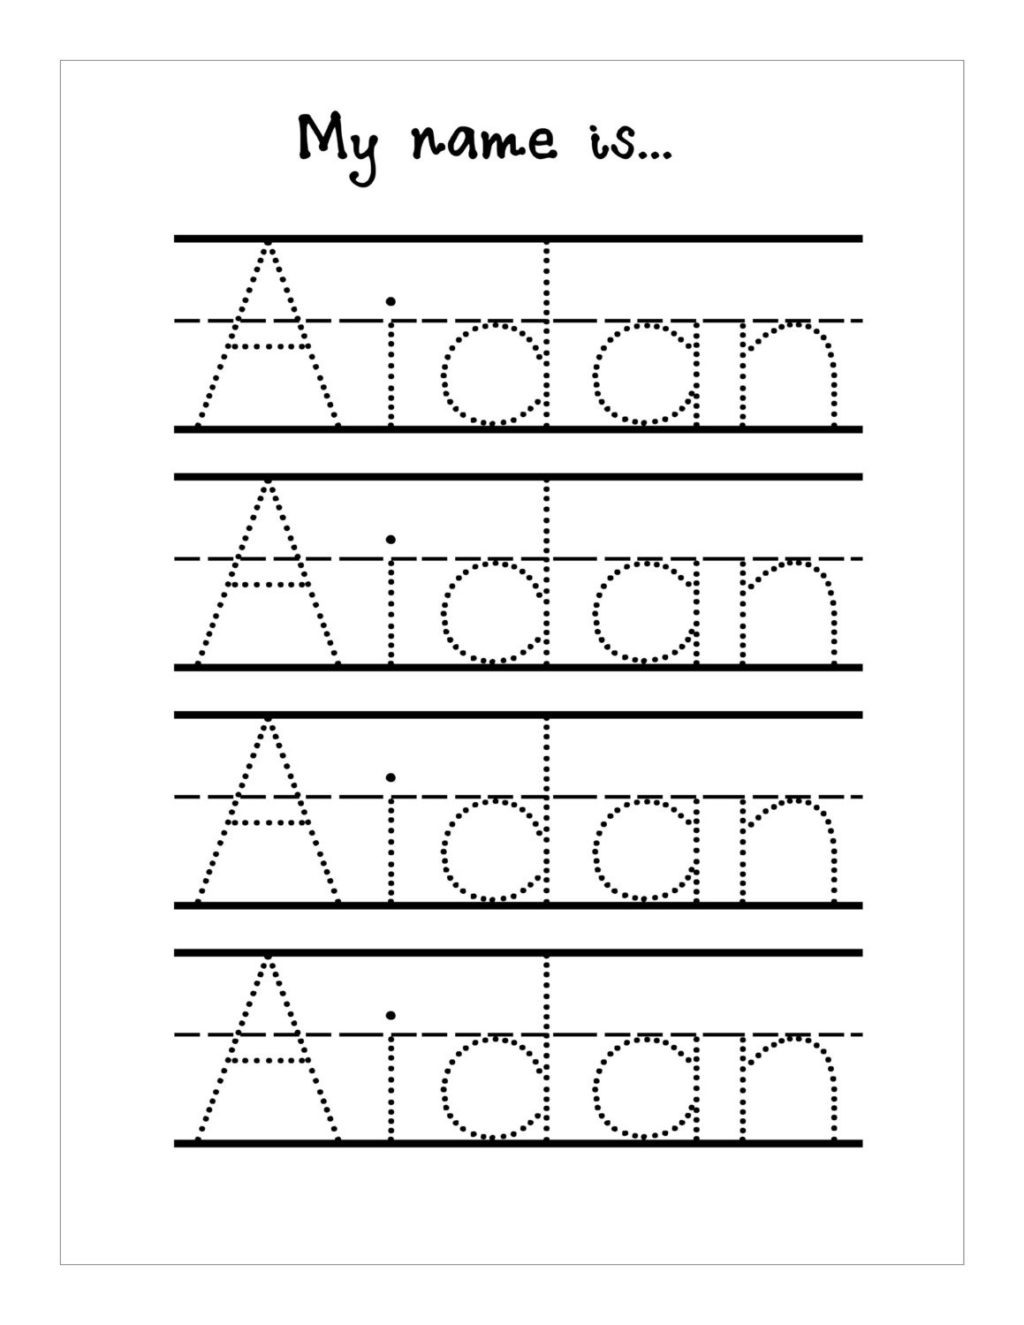 Worksheet ~ Trace Name Worksheets Custom Tracing Sheets regarding Name Tracing Booklet